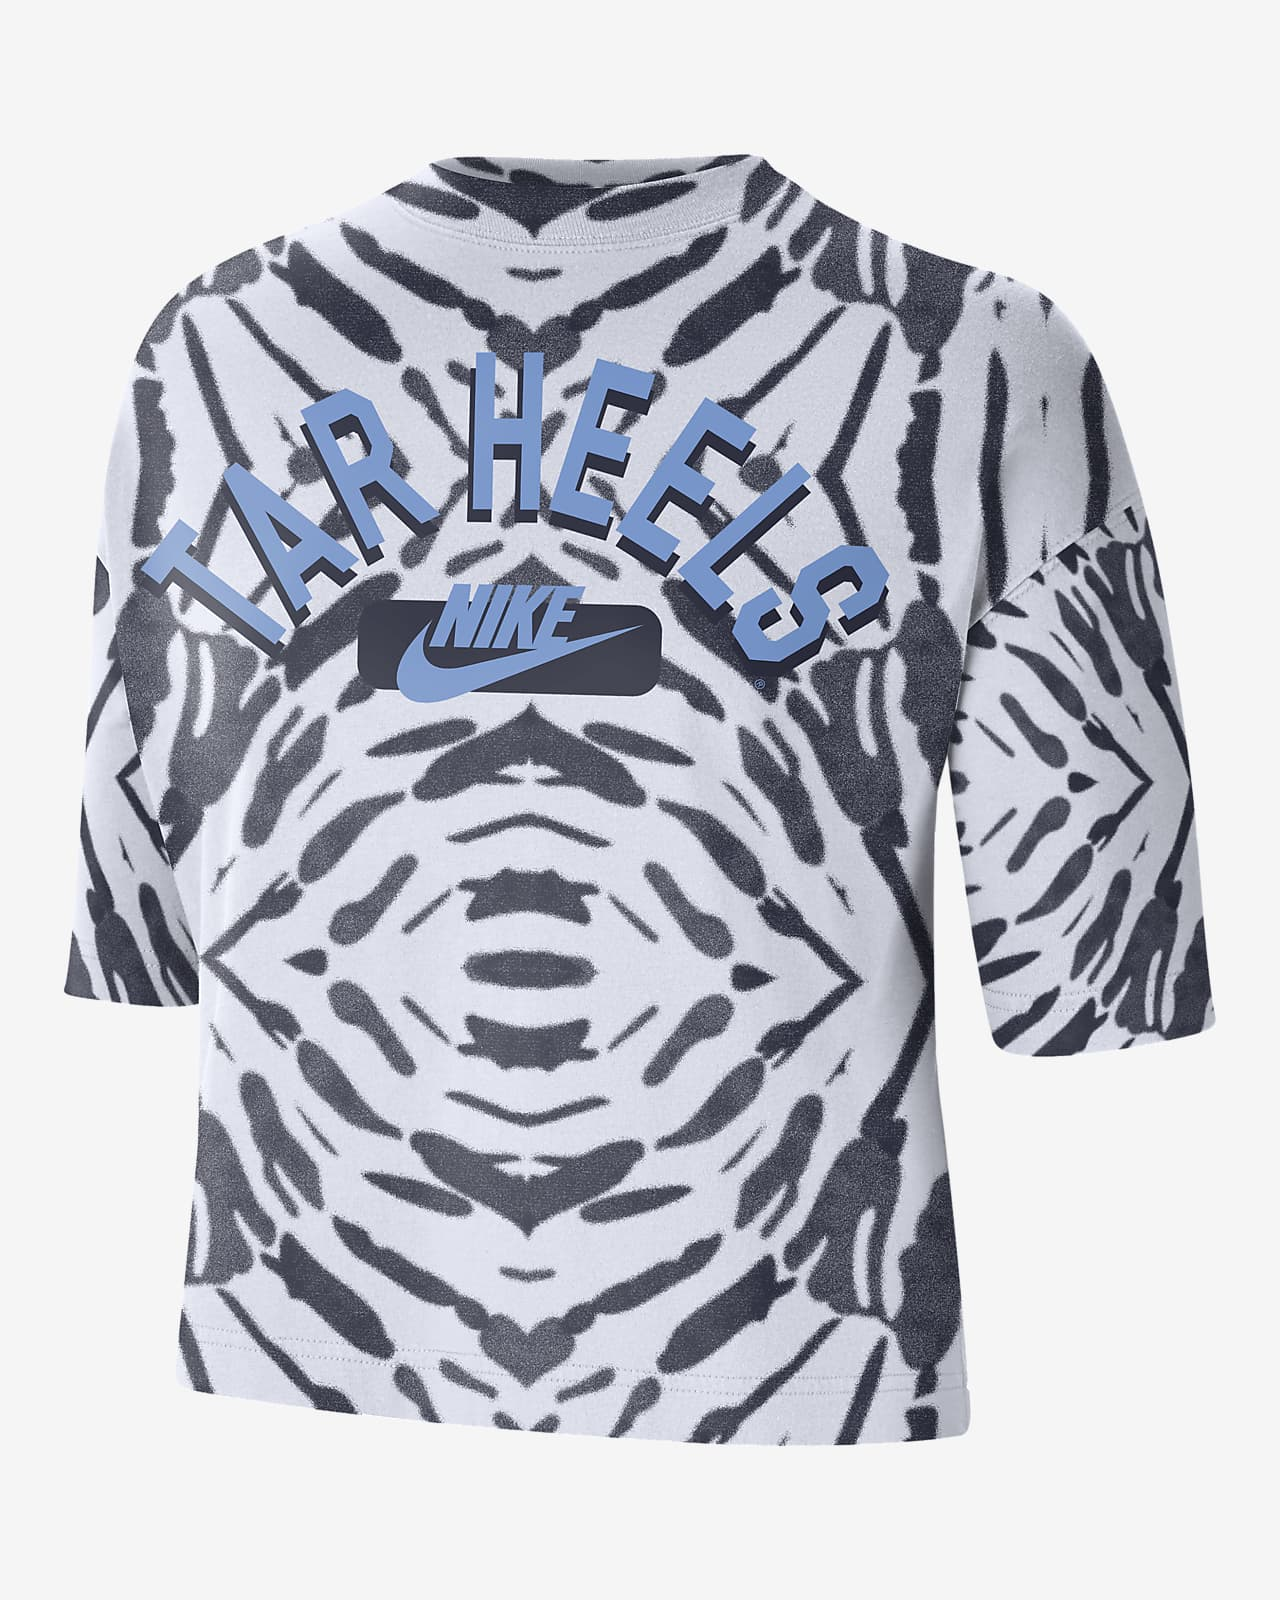 Nike College (UNC) Women's Boxy Printed T-Shirt